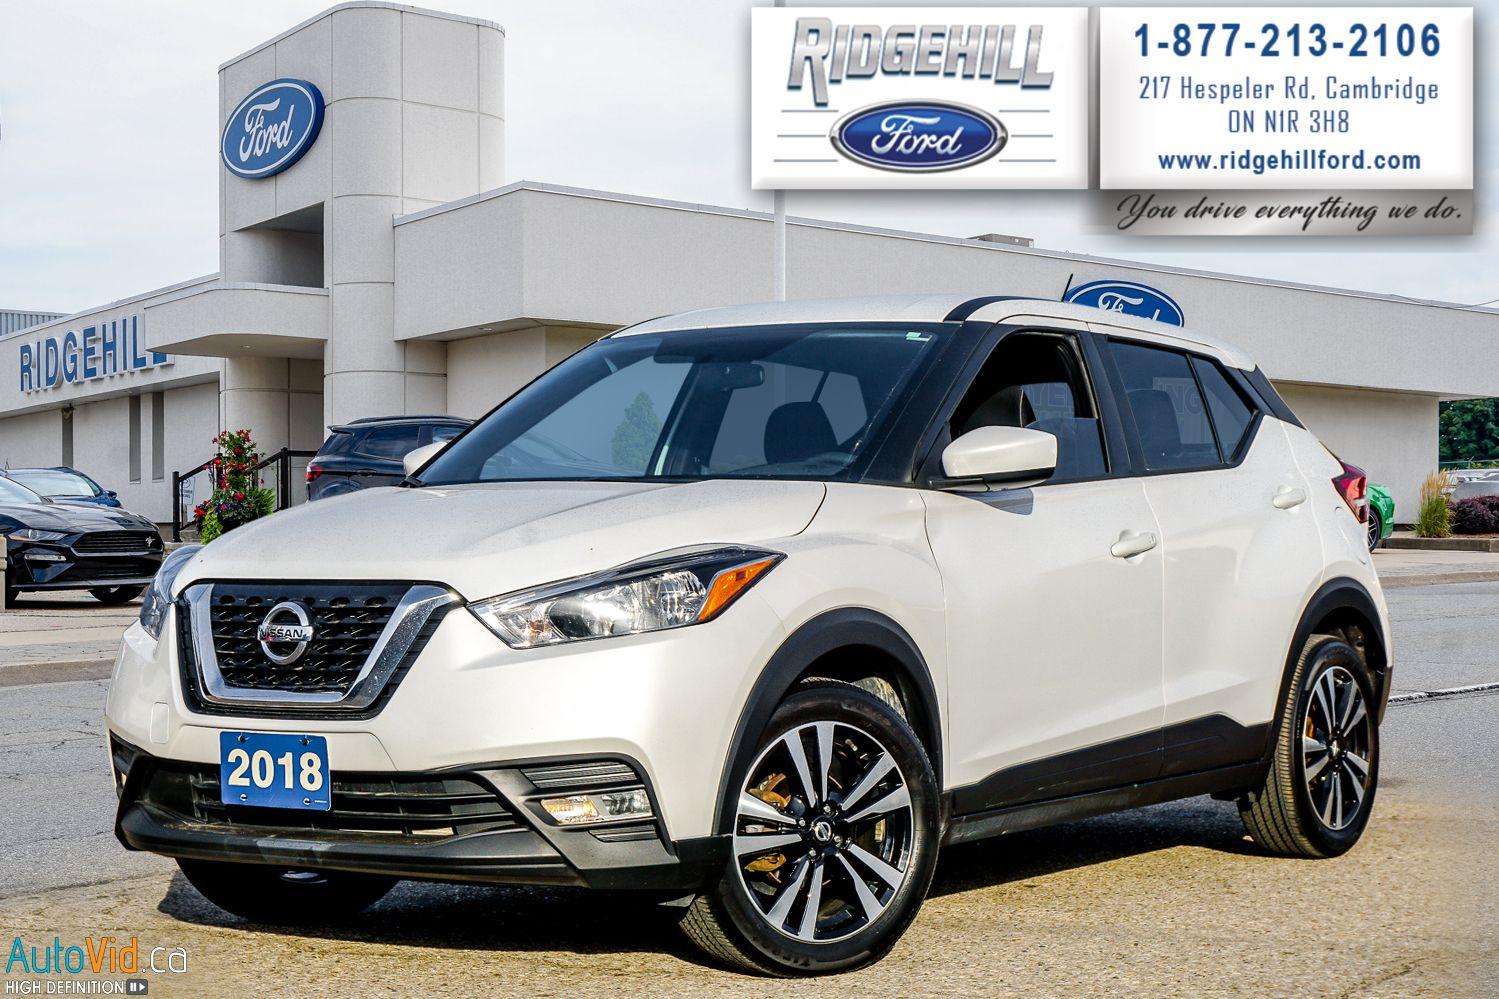 2018 Nissan Kicks Image